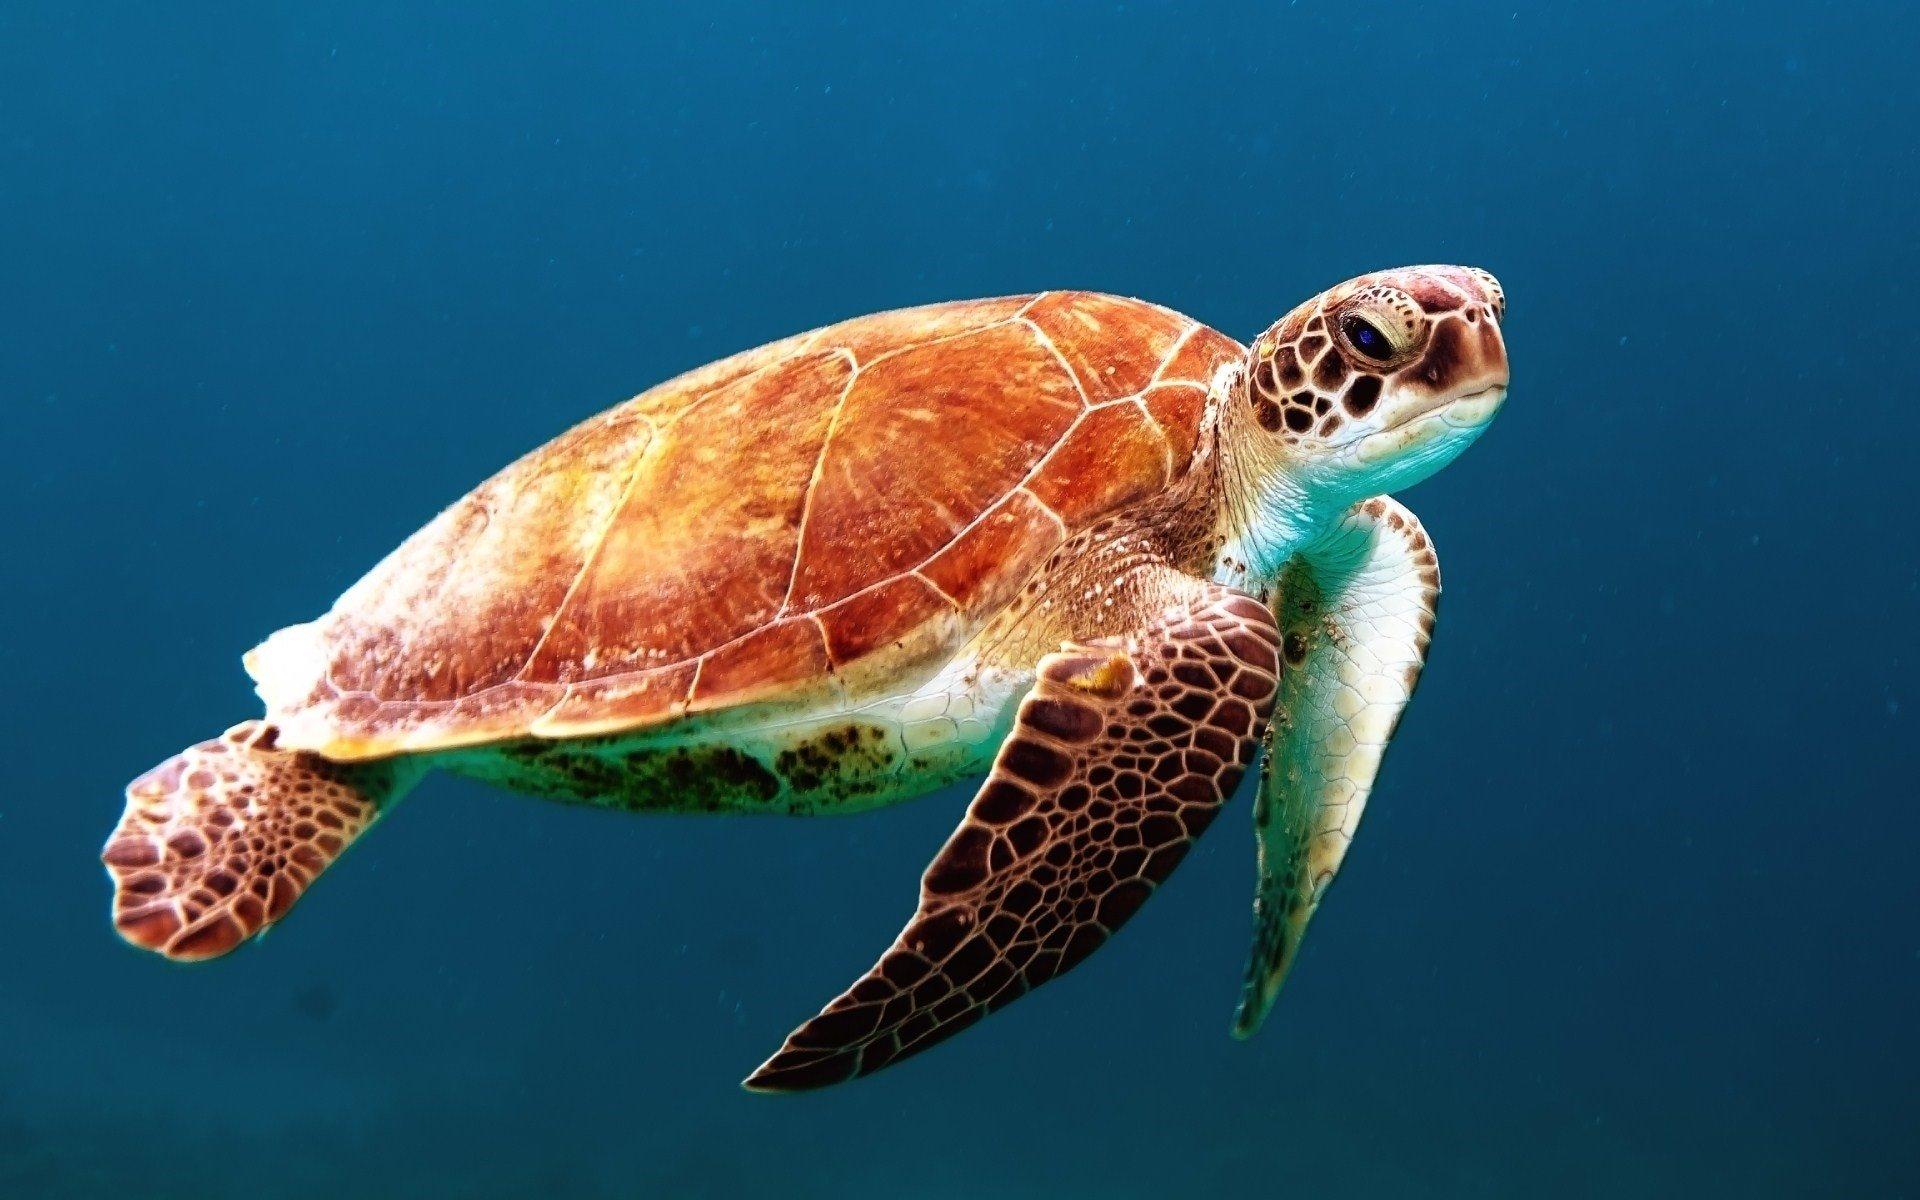 Animales acuáticos, tortuga marina